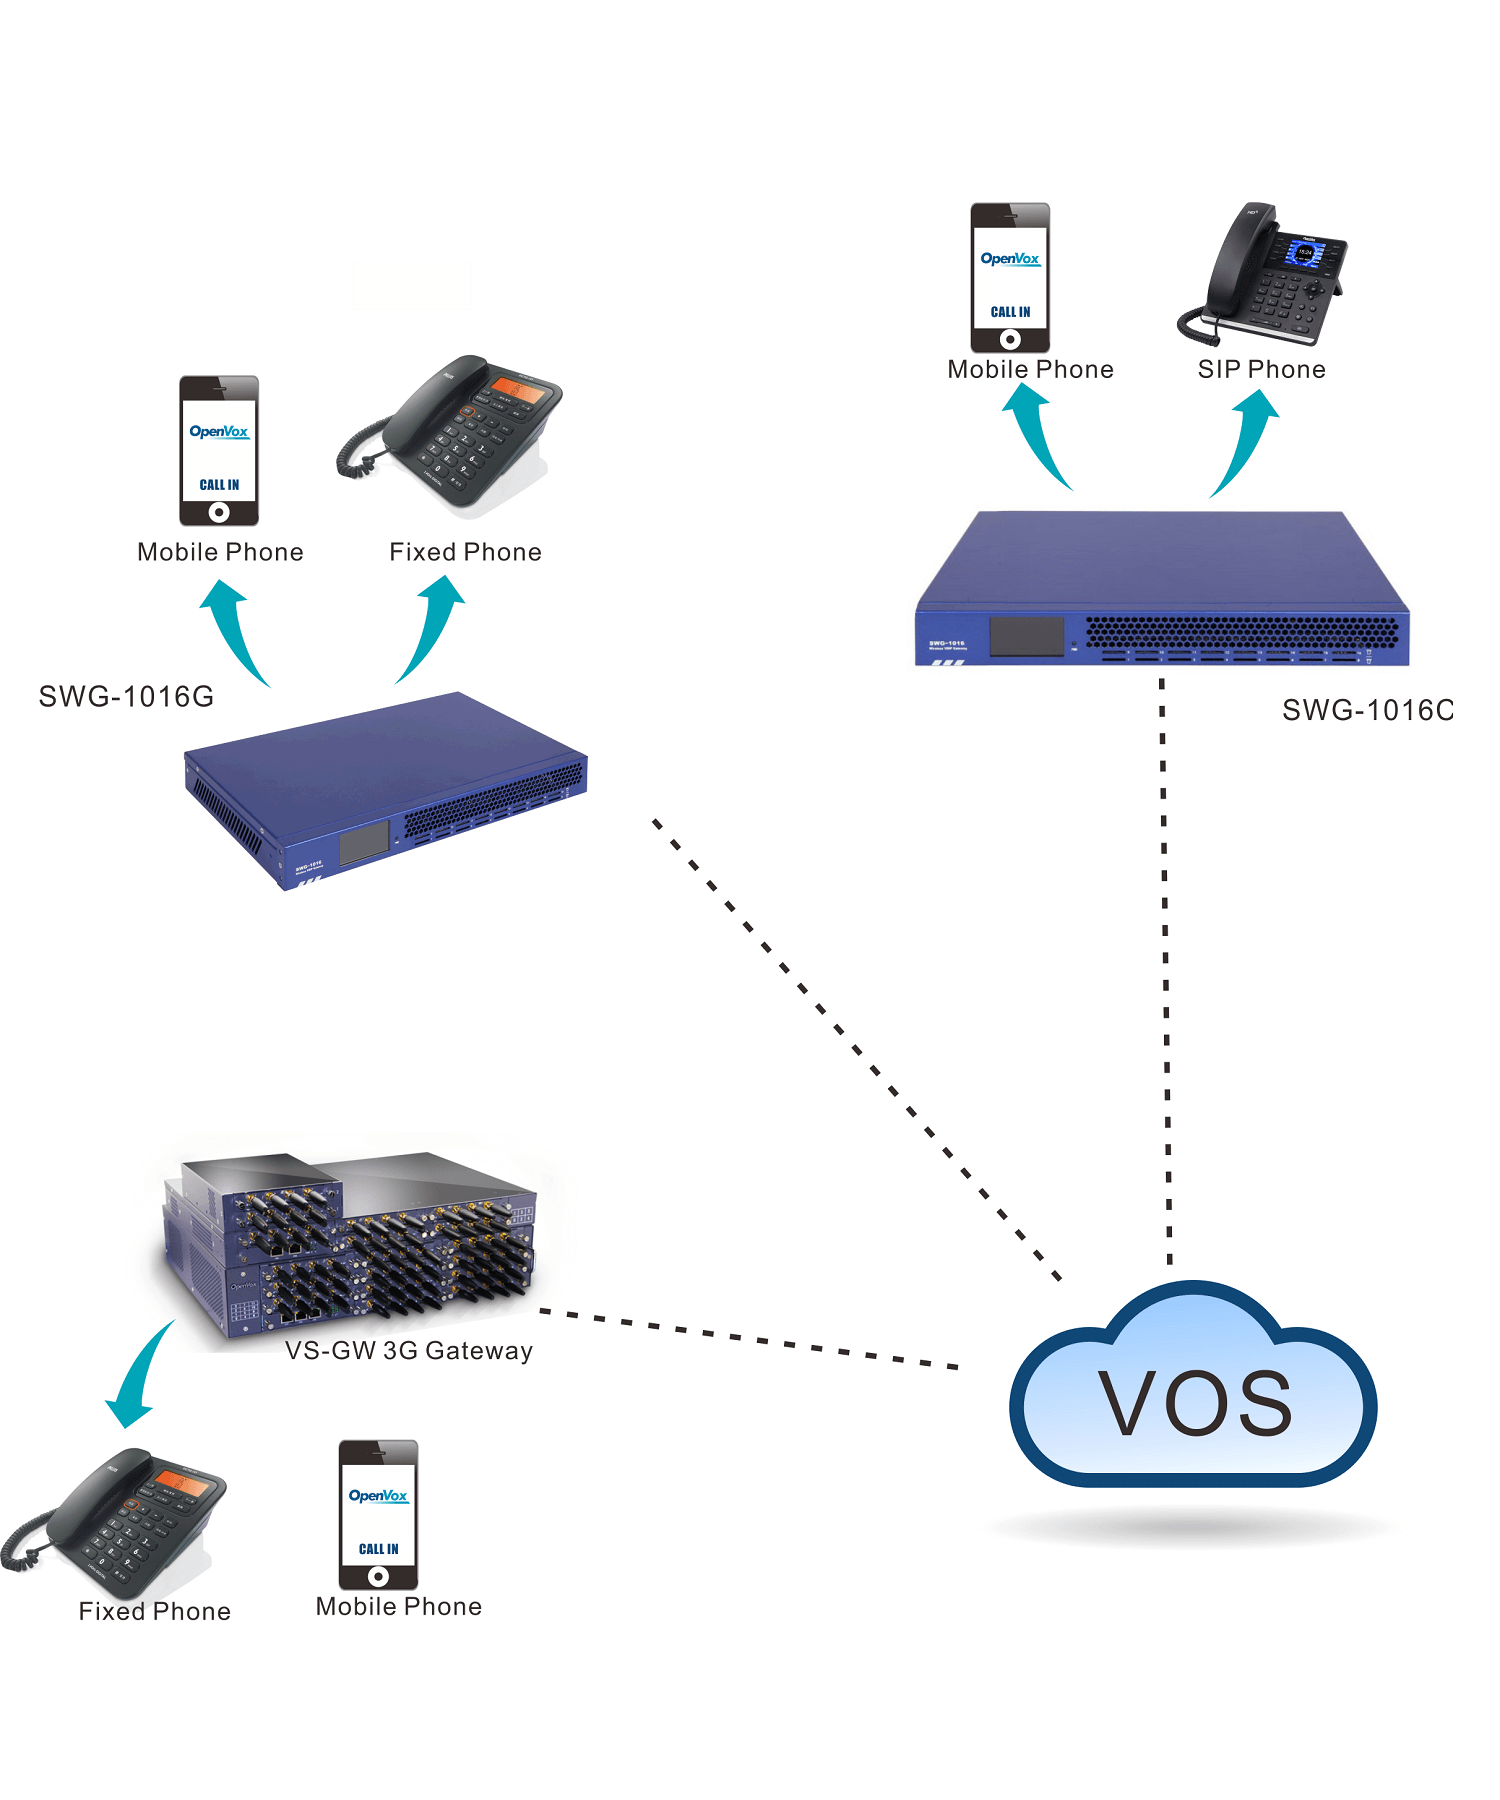 VS-GW2120 V2 Wireless Gateway - OpenVox